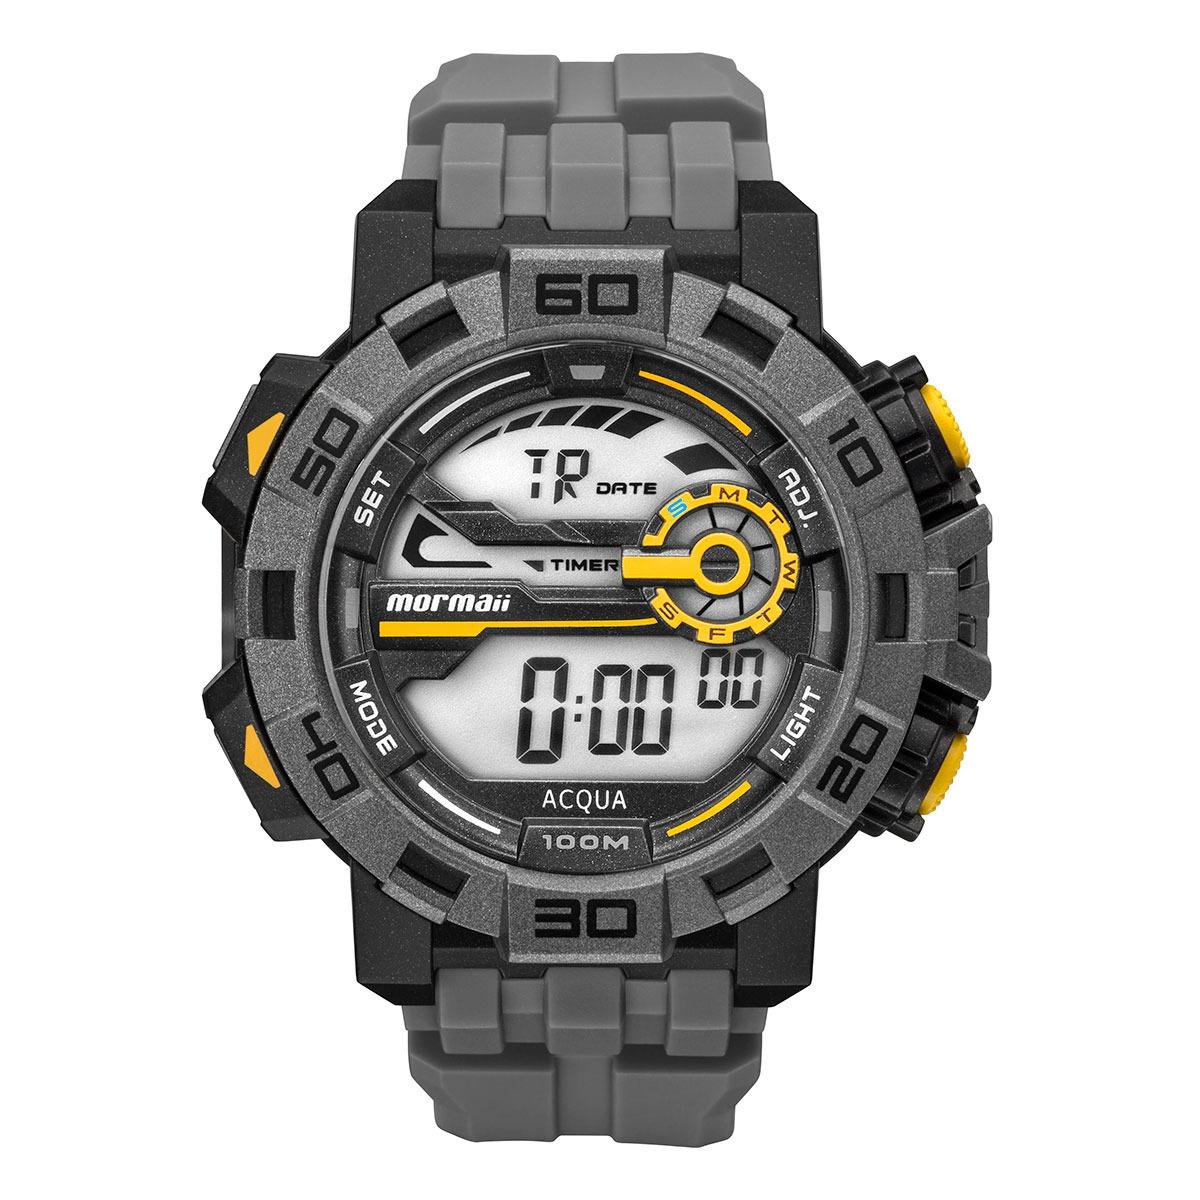 711d2da259703 Relógio Mormaii Acqua Masculino Mo1148ac 8c - R  229